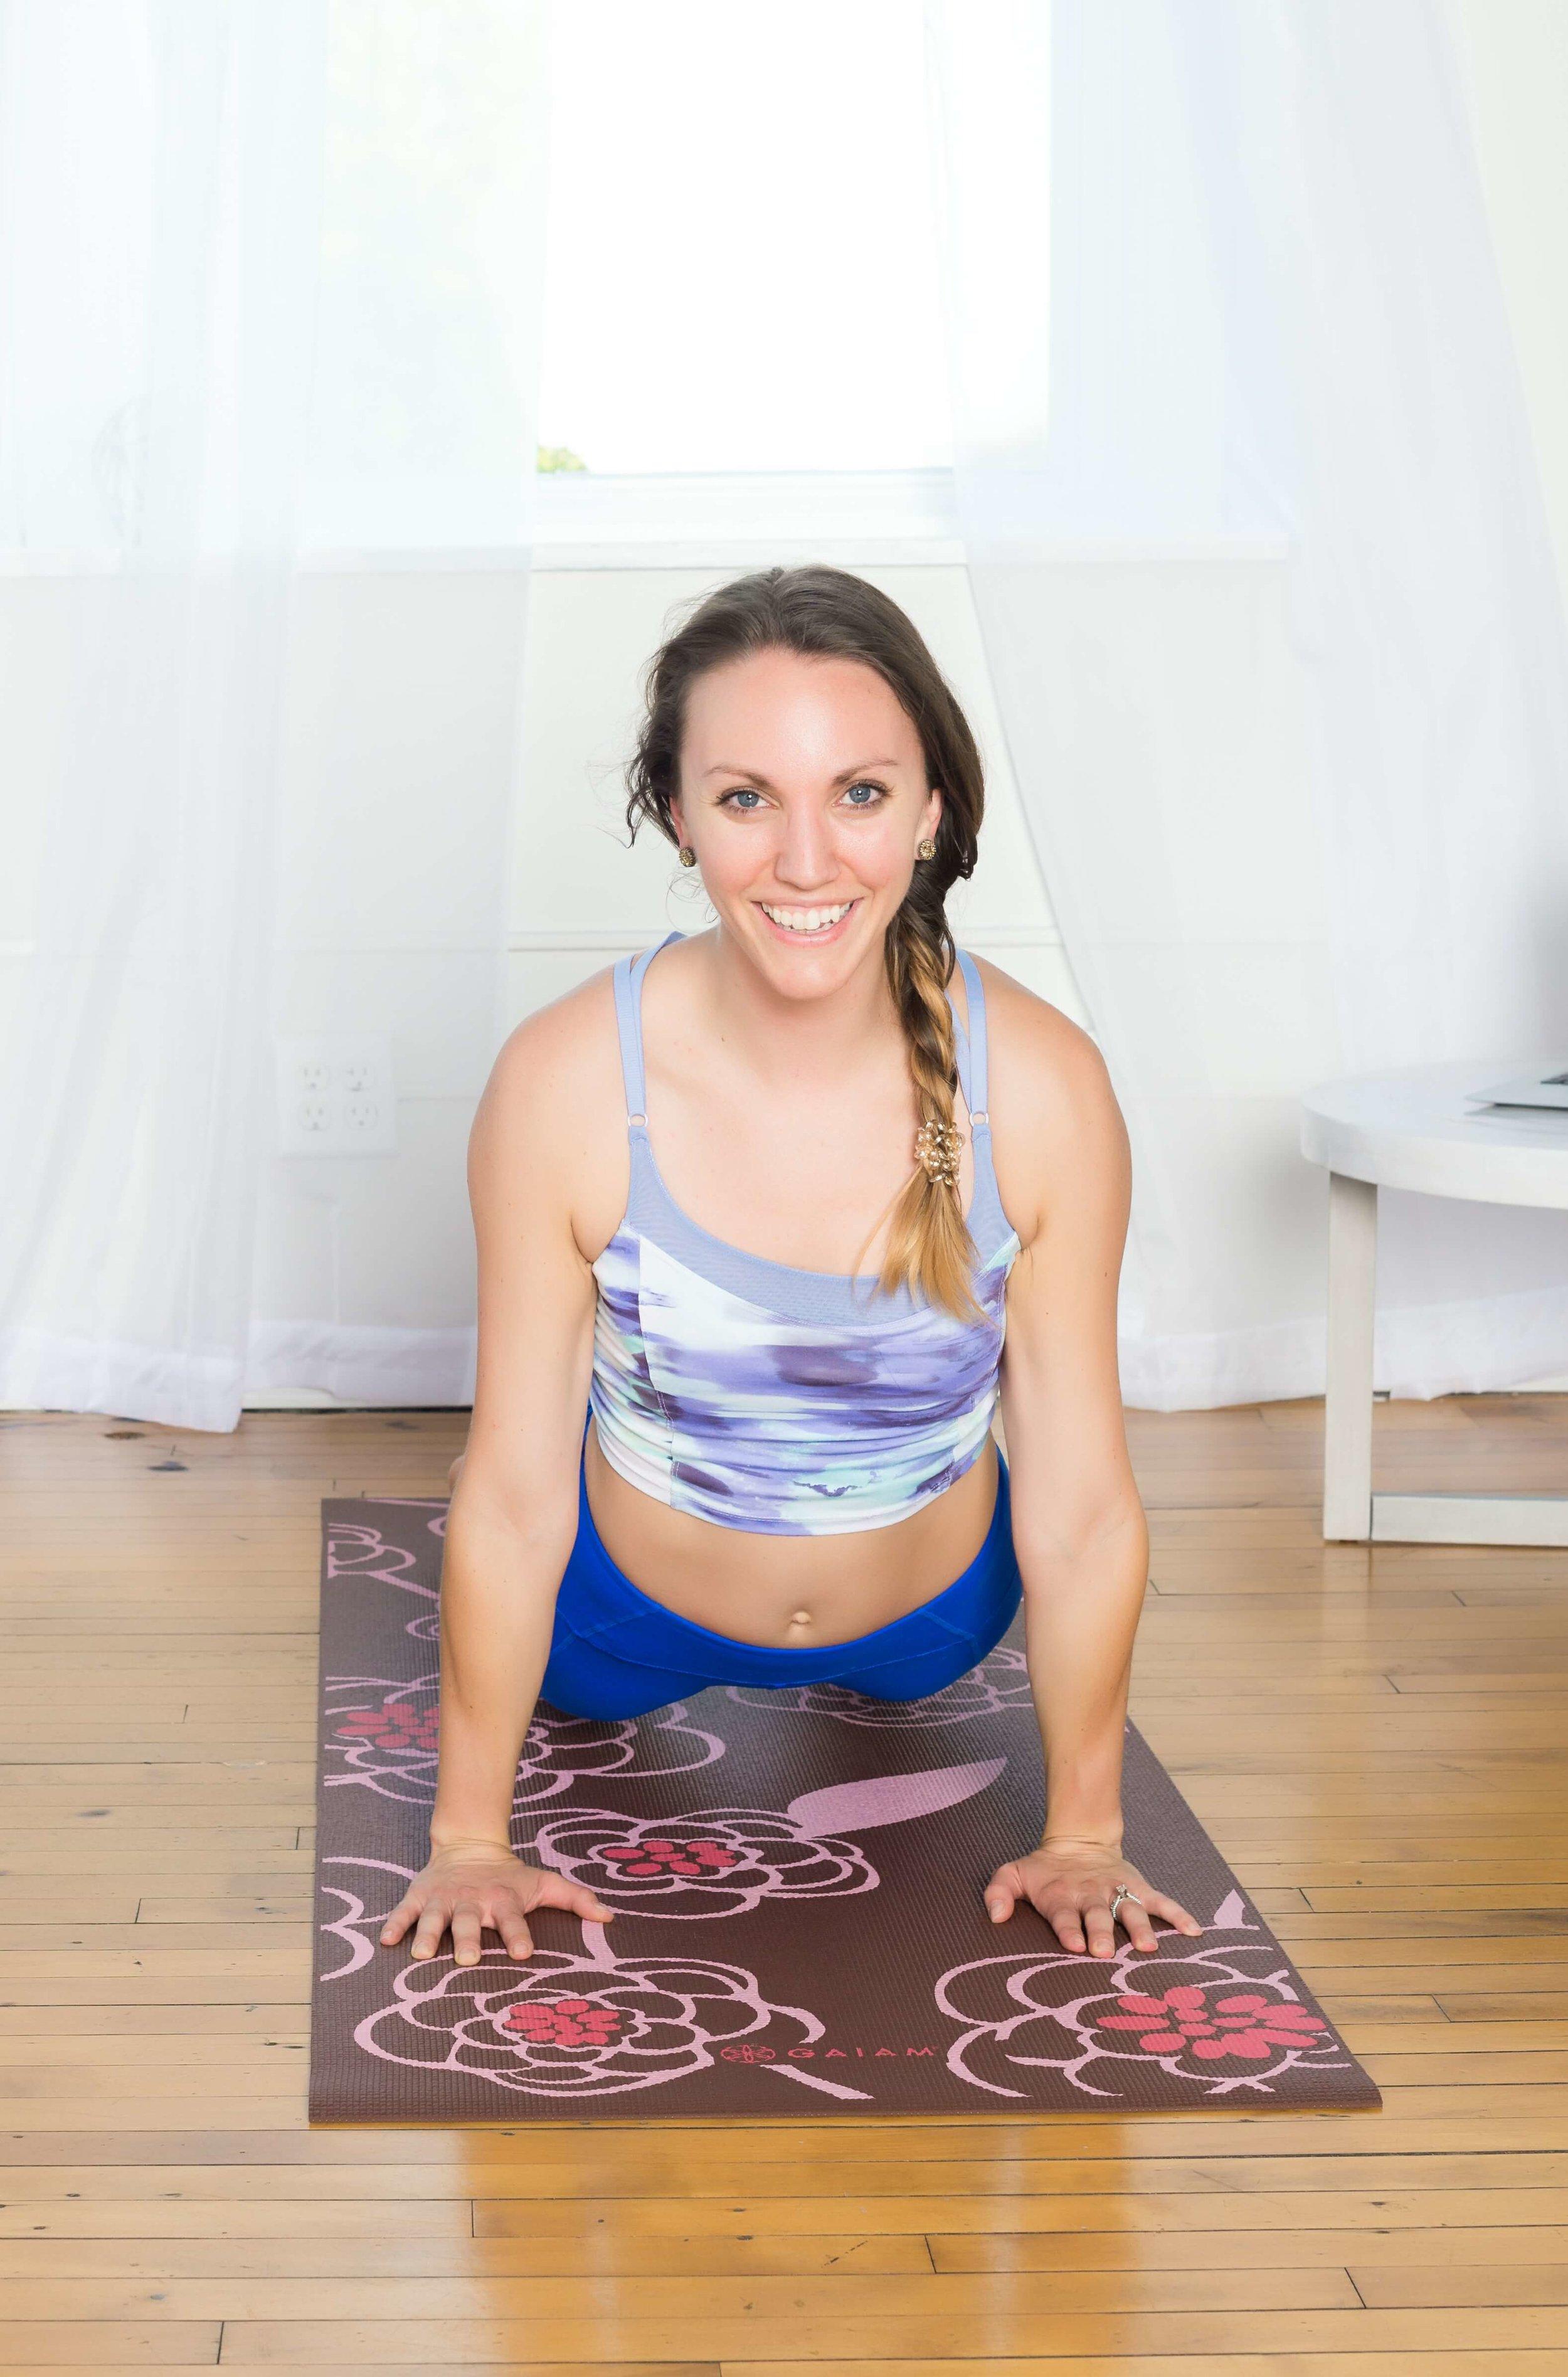 Chanel Nicole _ Louisville Photographer Tamera- yogo moves.jpg